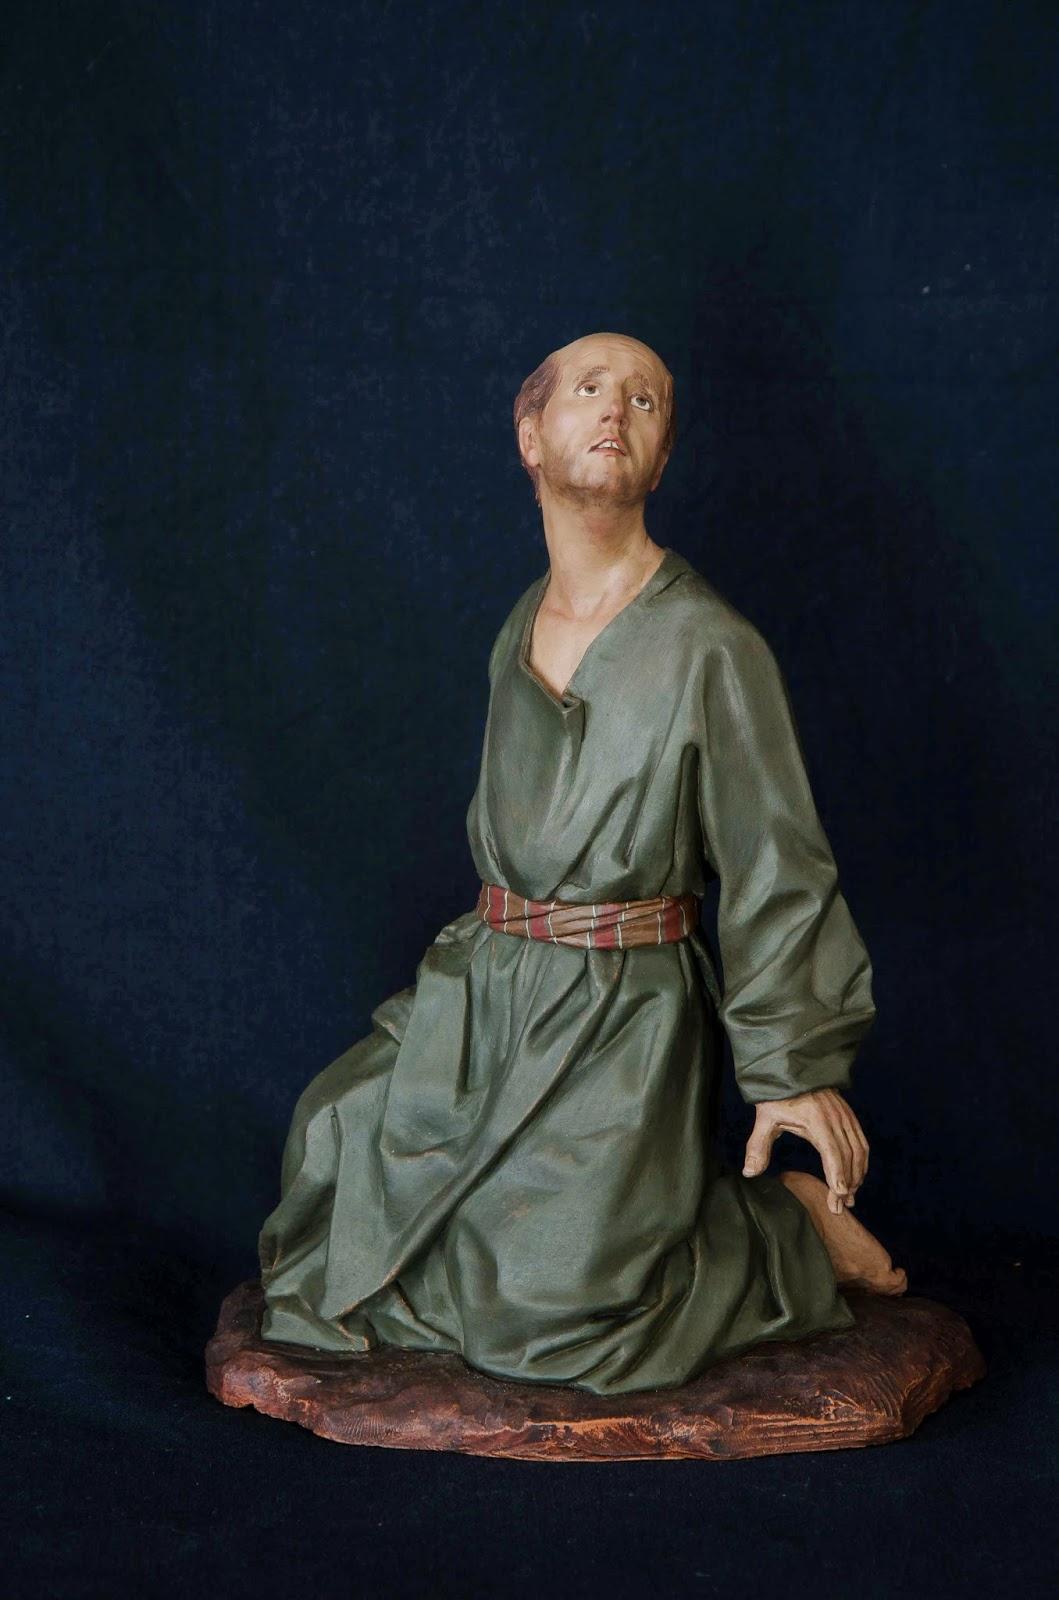 Belén presepe nativity krippe Arturo Serra escultura barro cocido 19